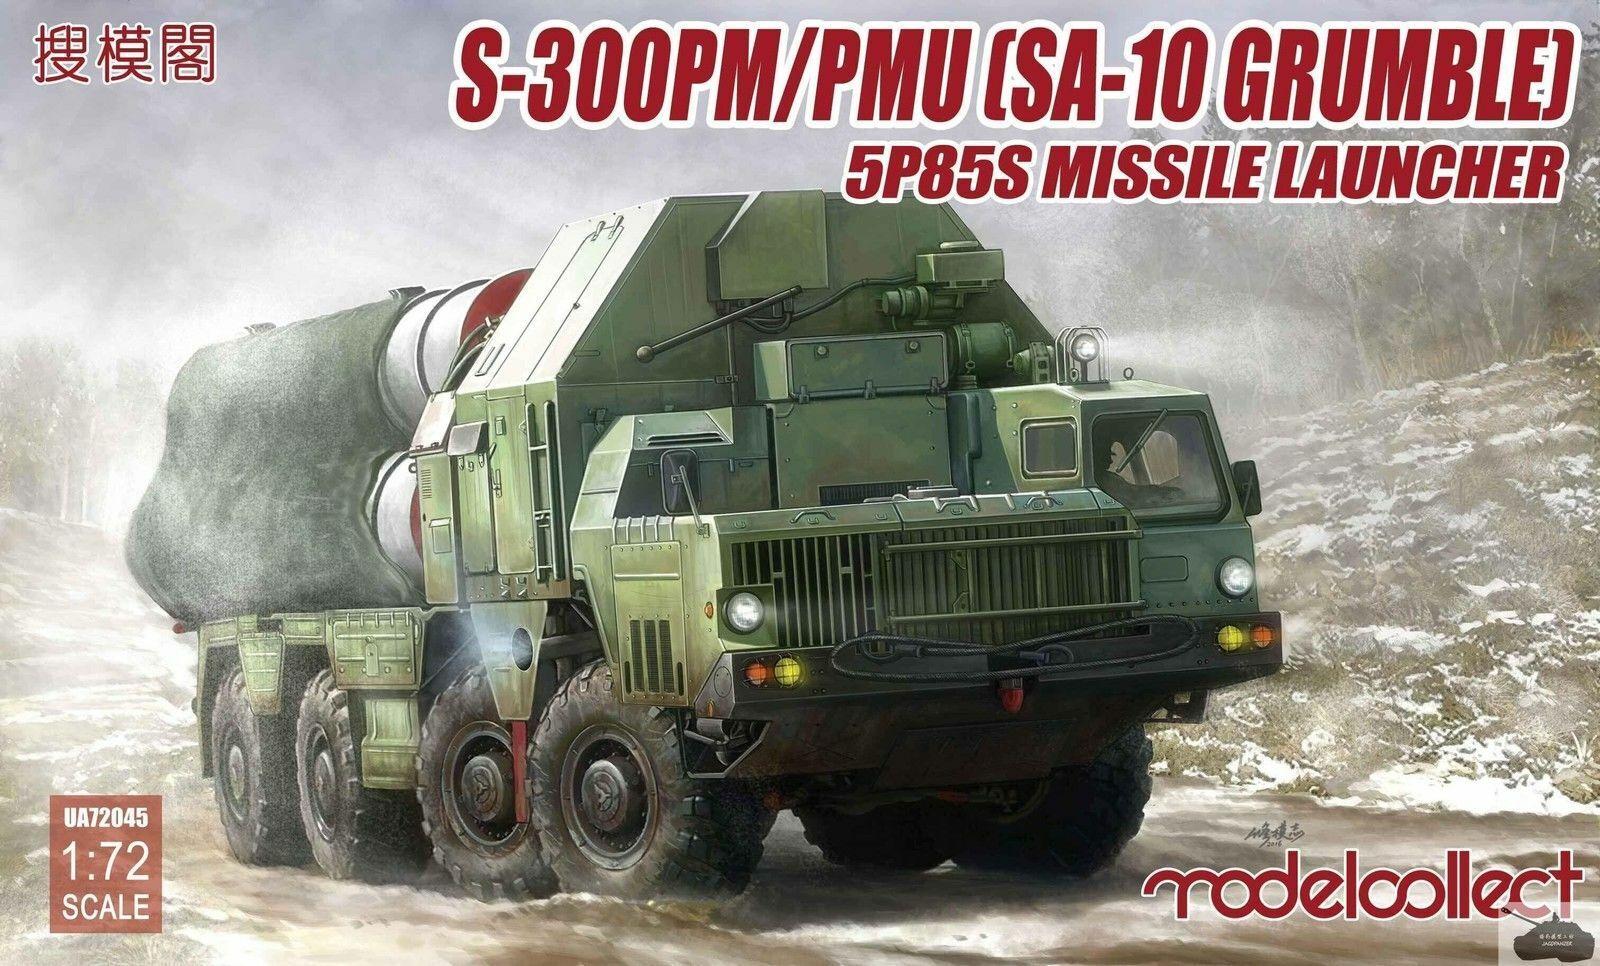 Model Collect 1 72 S-300 PM PMU(SA-10 Grumble) 5P85S Missile Launcher